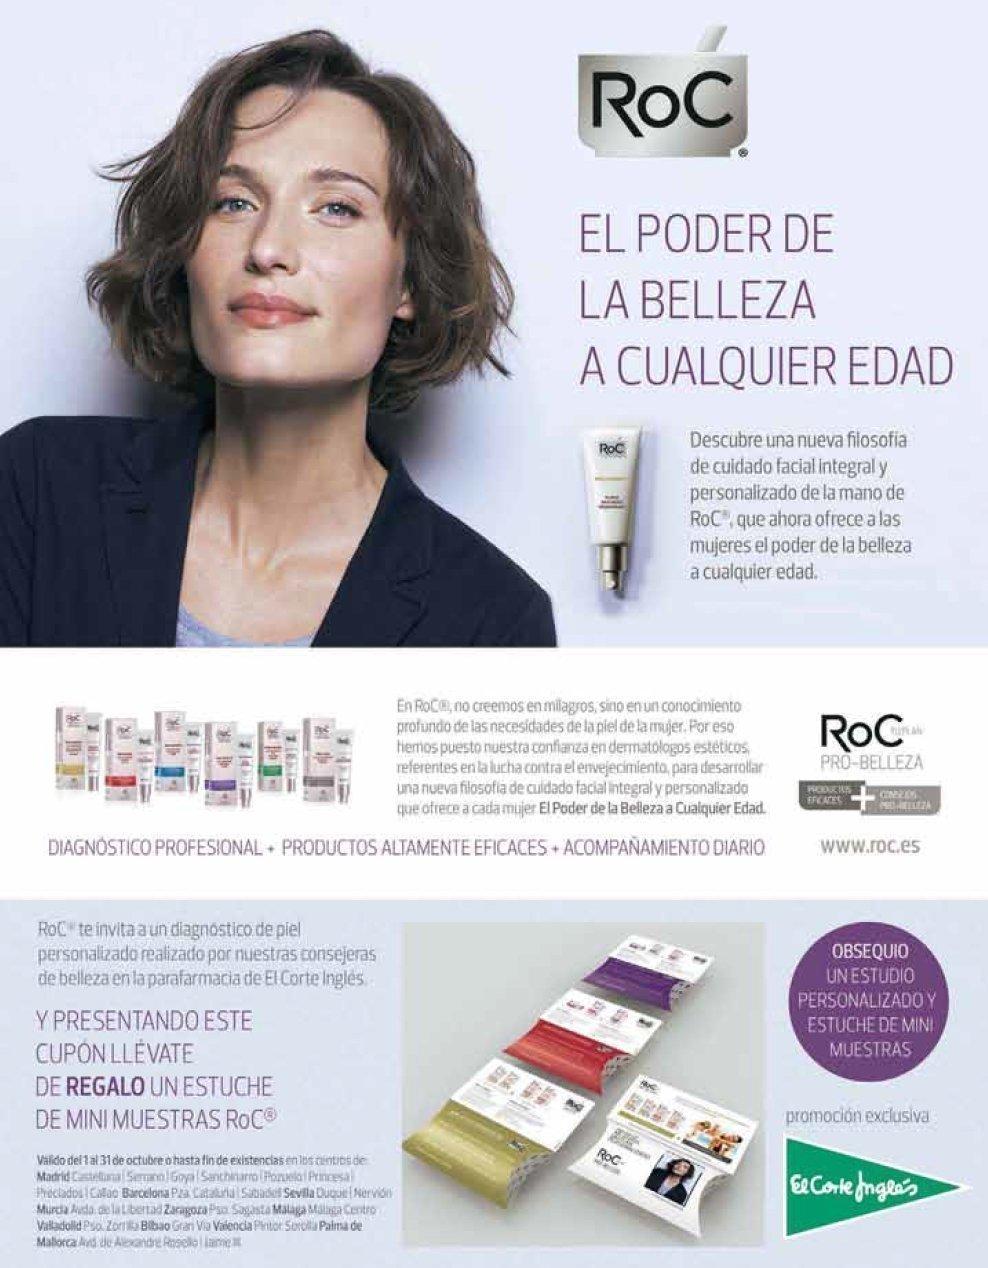 http://regalosymuestrasgratis.com/wp-content/uploads/2015/10/muestras-gratis-roc.jpg